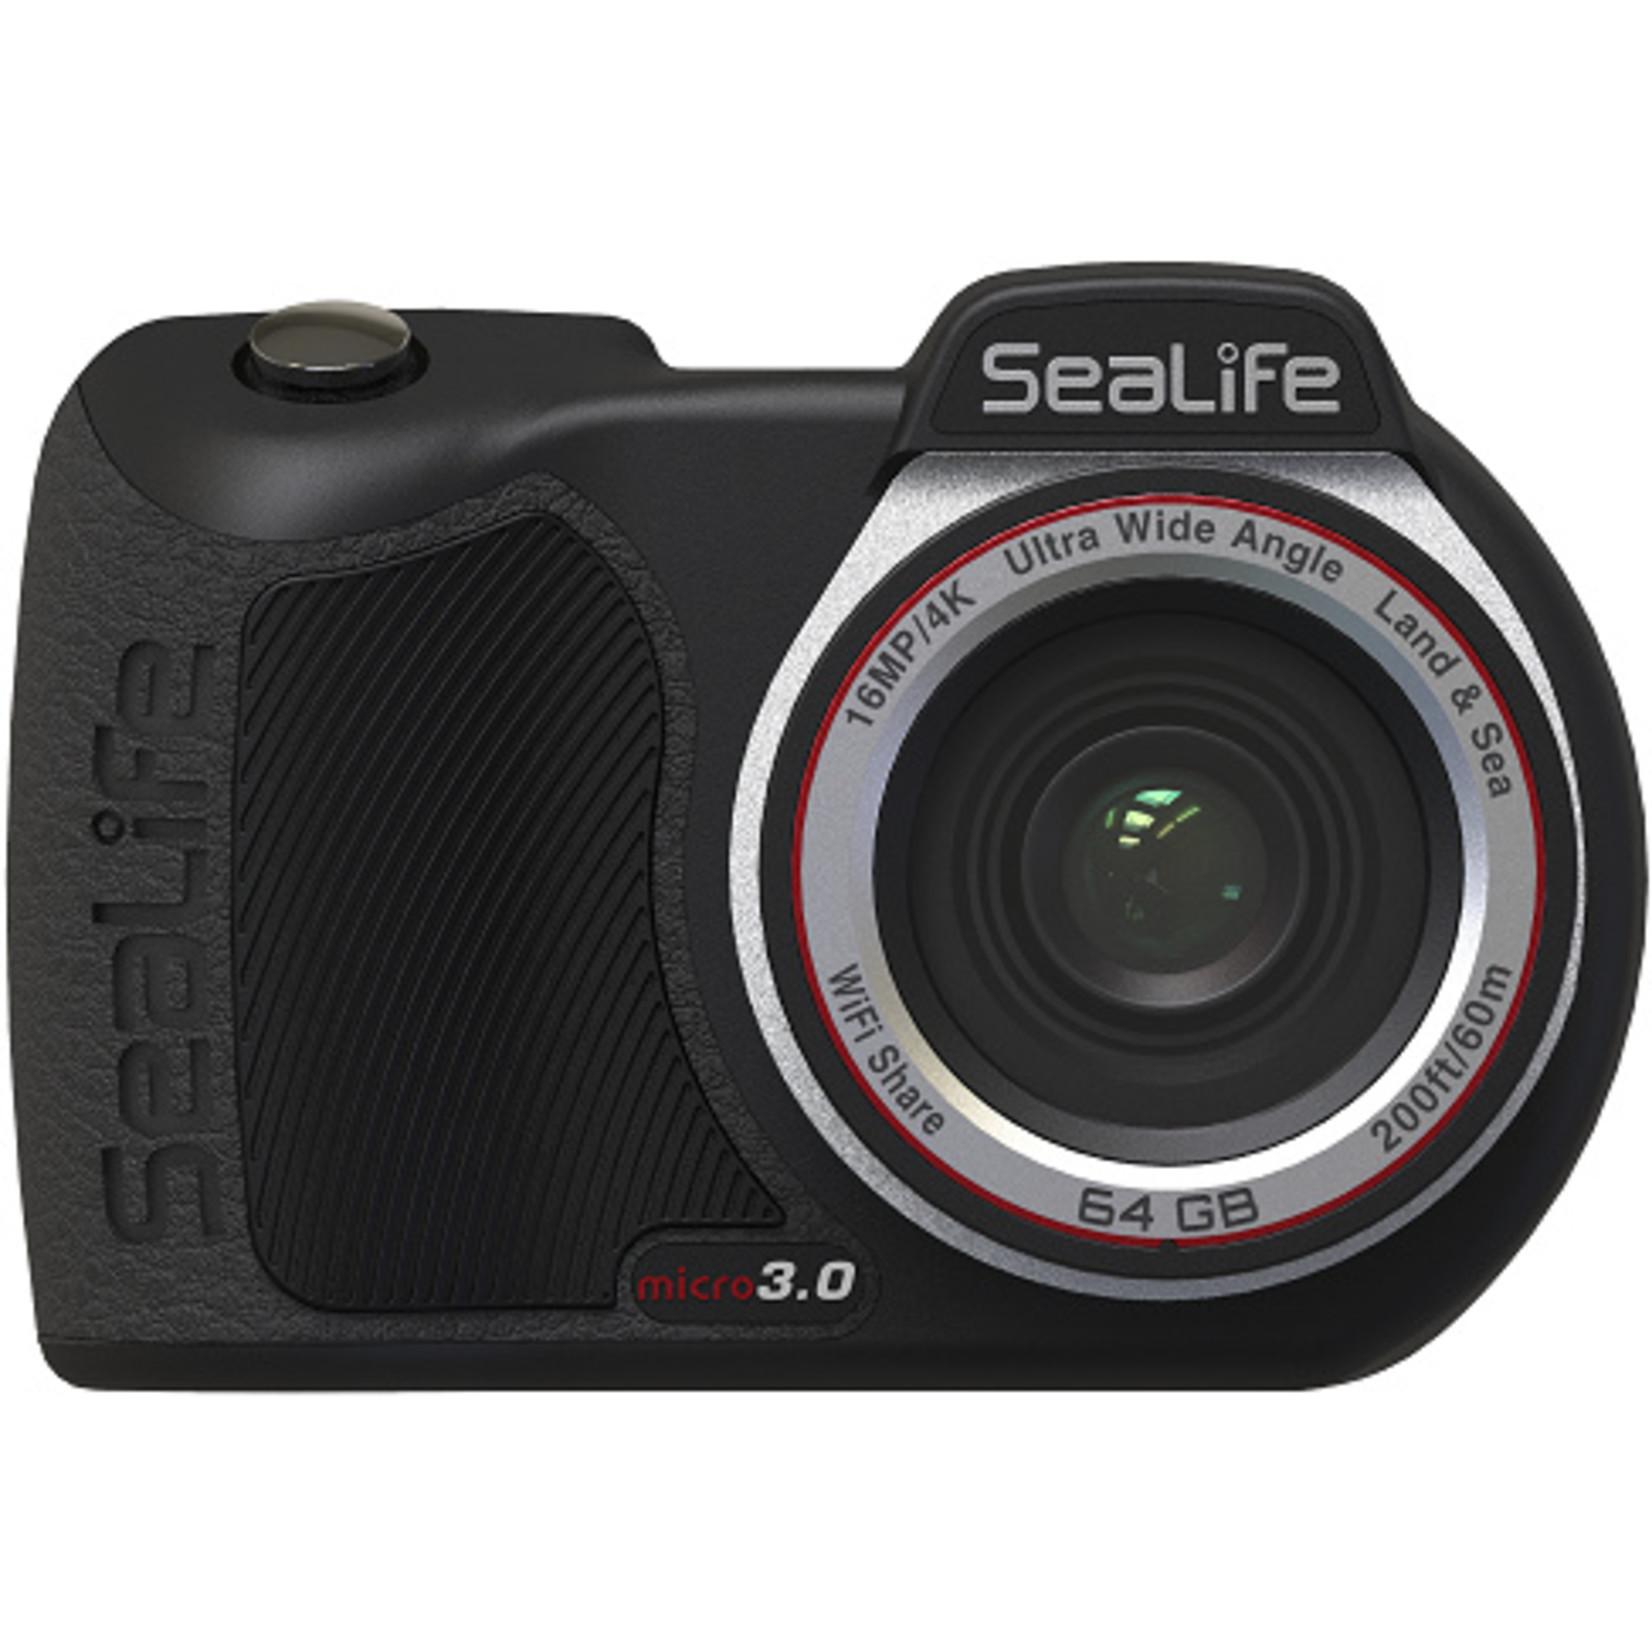 Sealife Sealife Micro 3.0 64 GB underwater camera